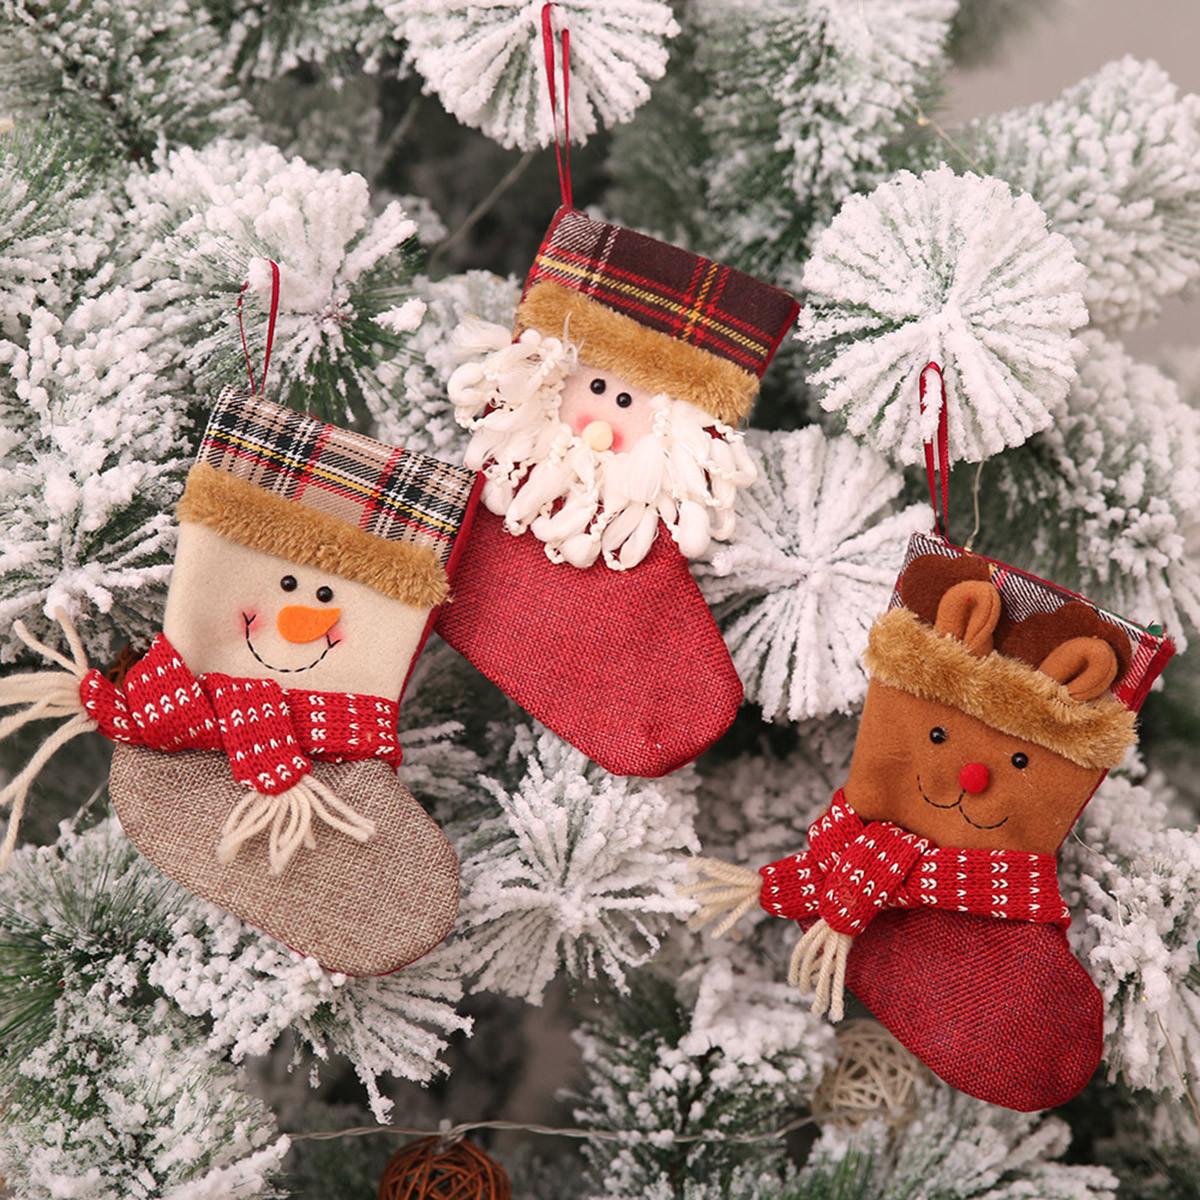 РождественскийчулокМининосокСанта-Клаусаконфеты подарок Сумка Дерево висит декор 1TopShop